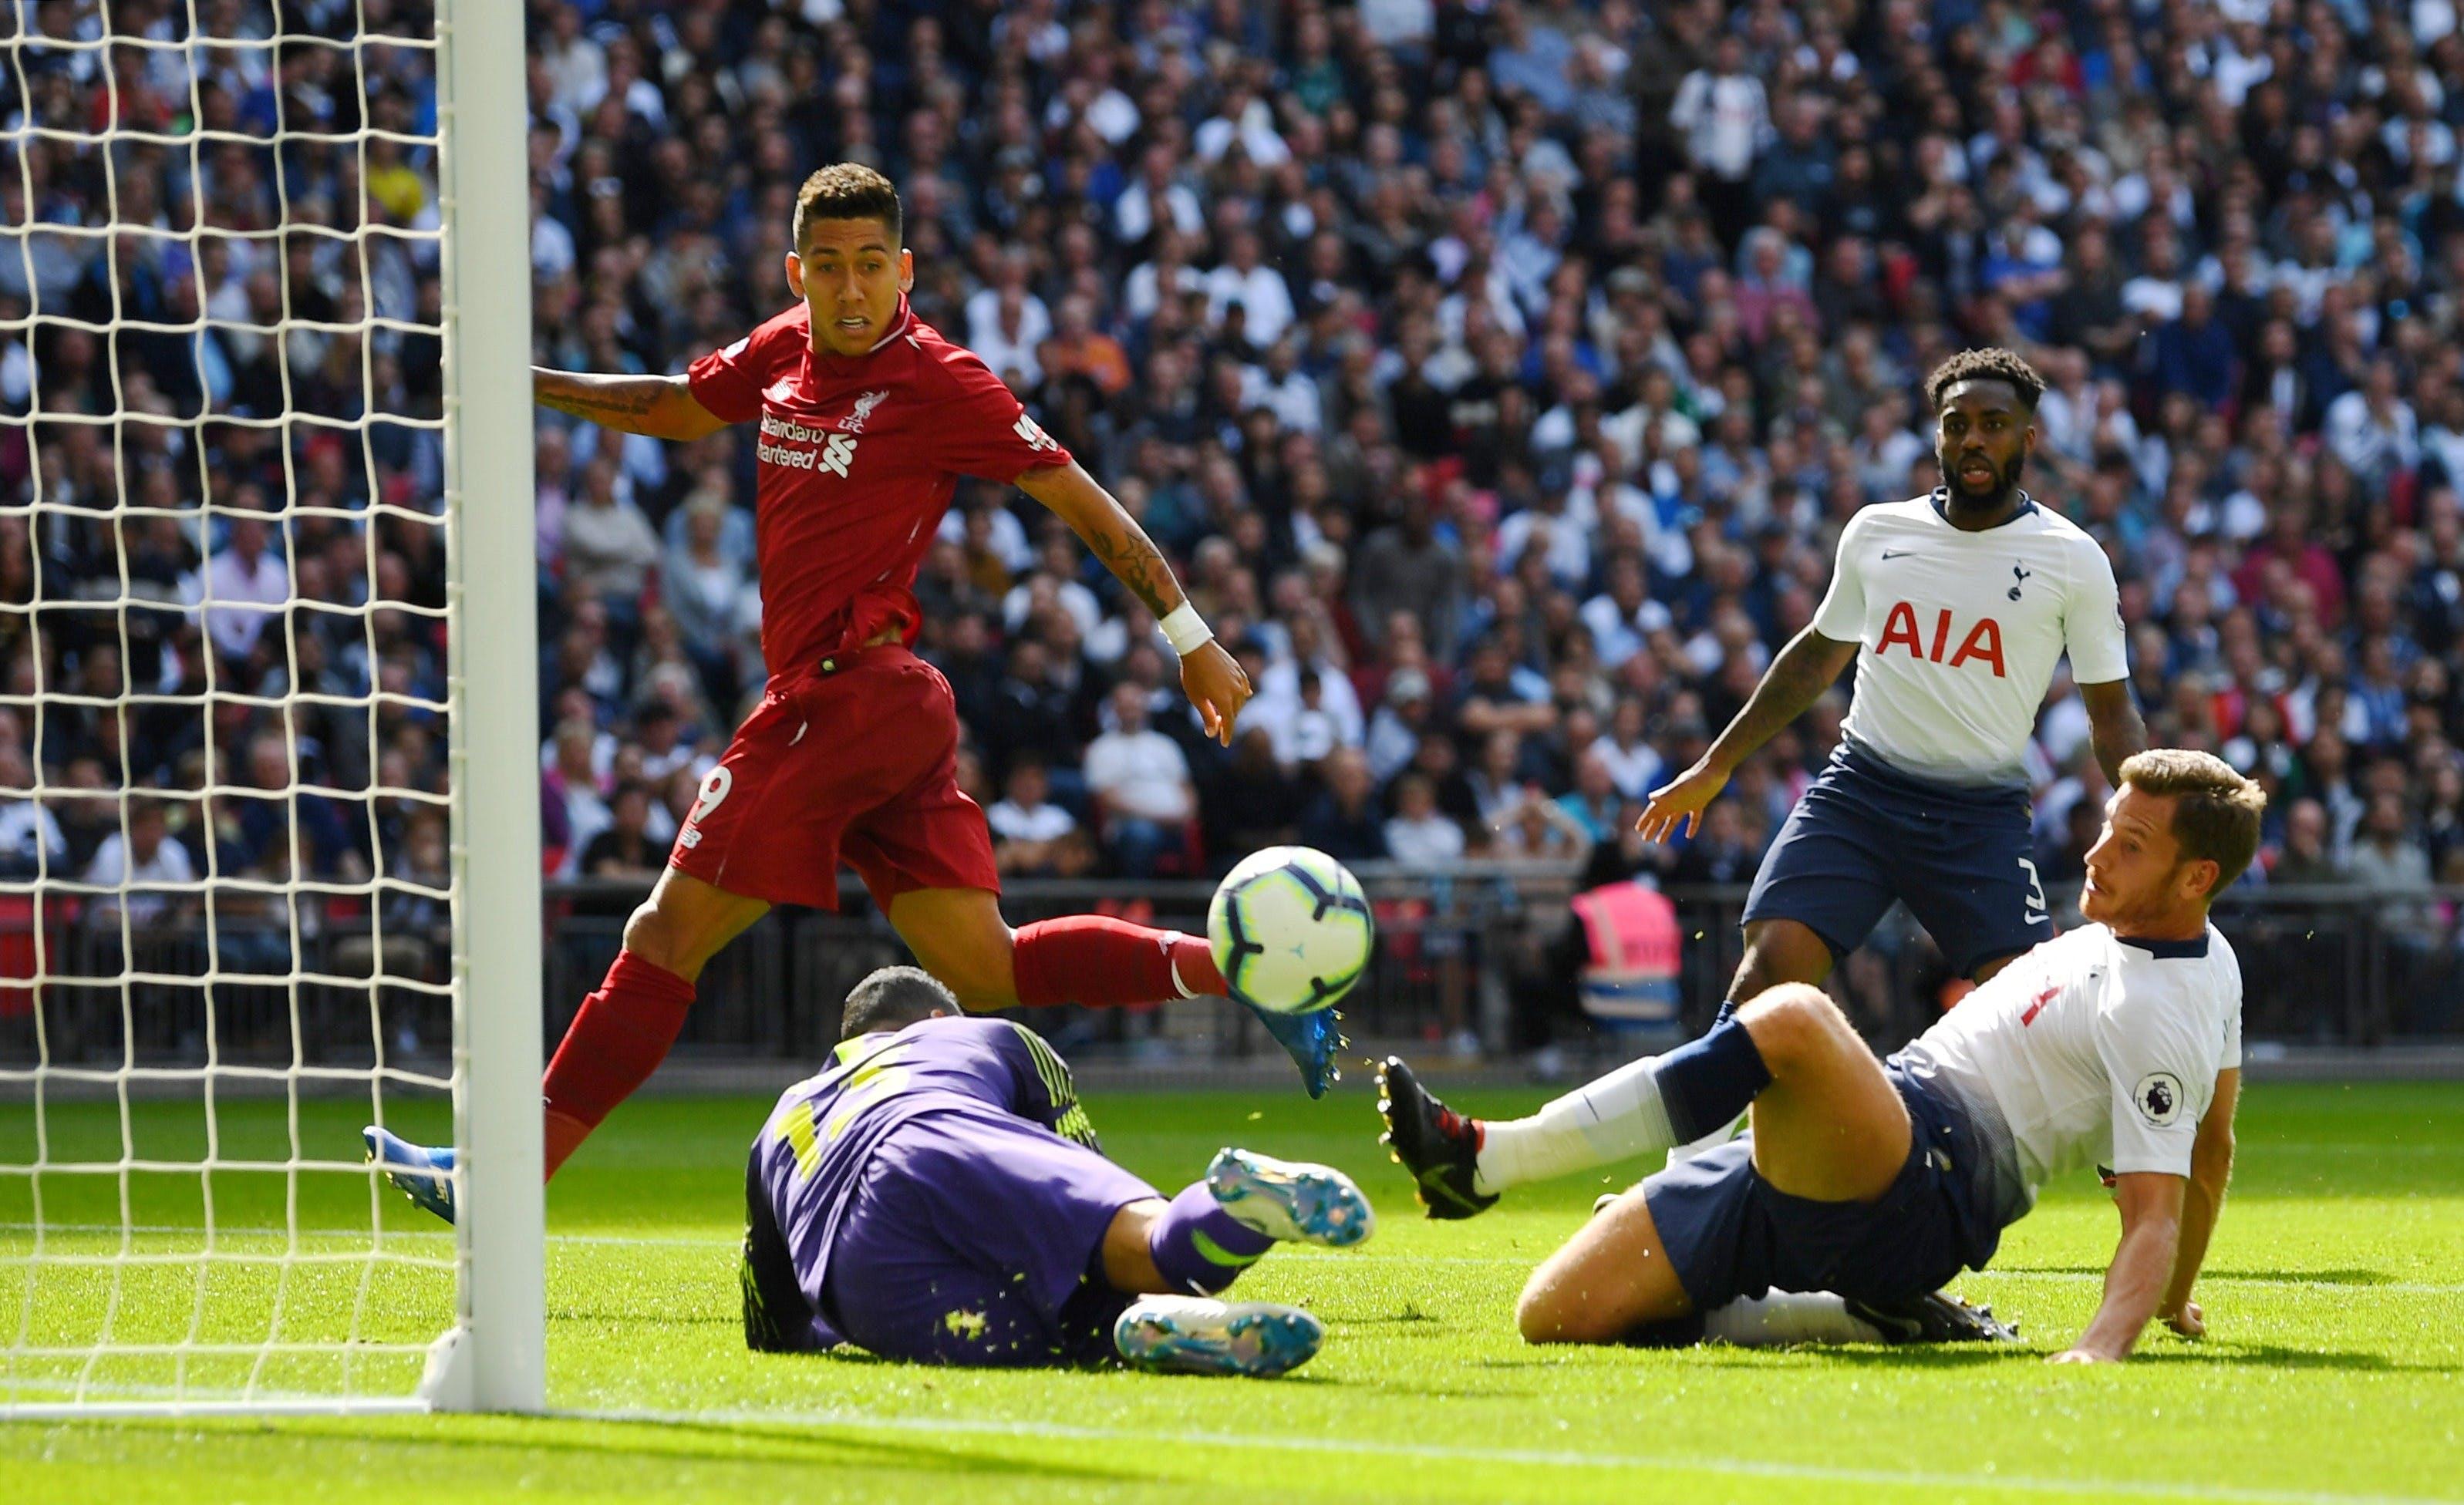 BetBlazers' Definitive Guide: Liverpool vs. Spurs